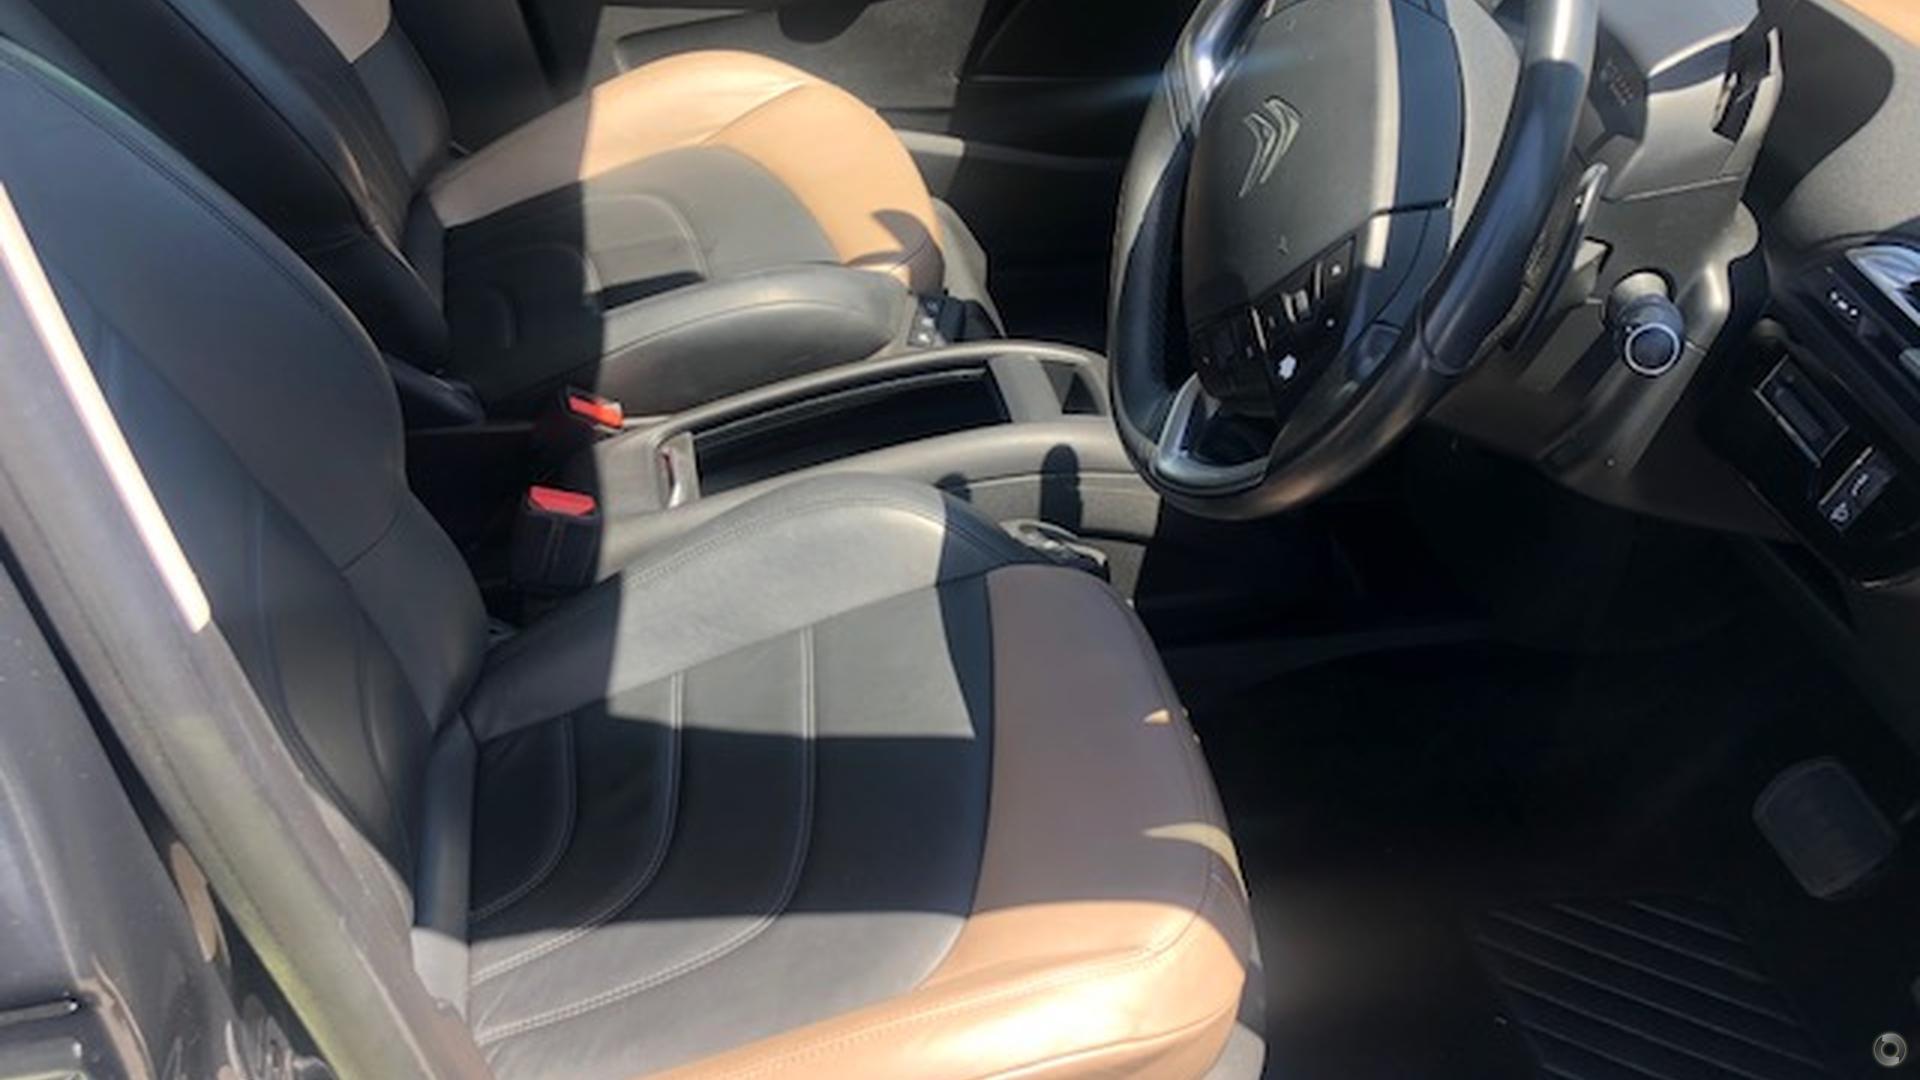 2014 Citroen Grand C4 Picasso Exclusive B7